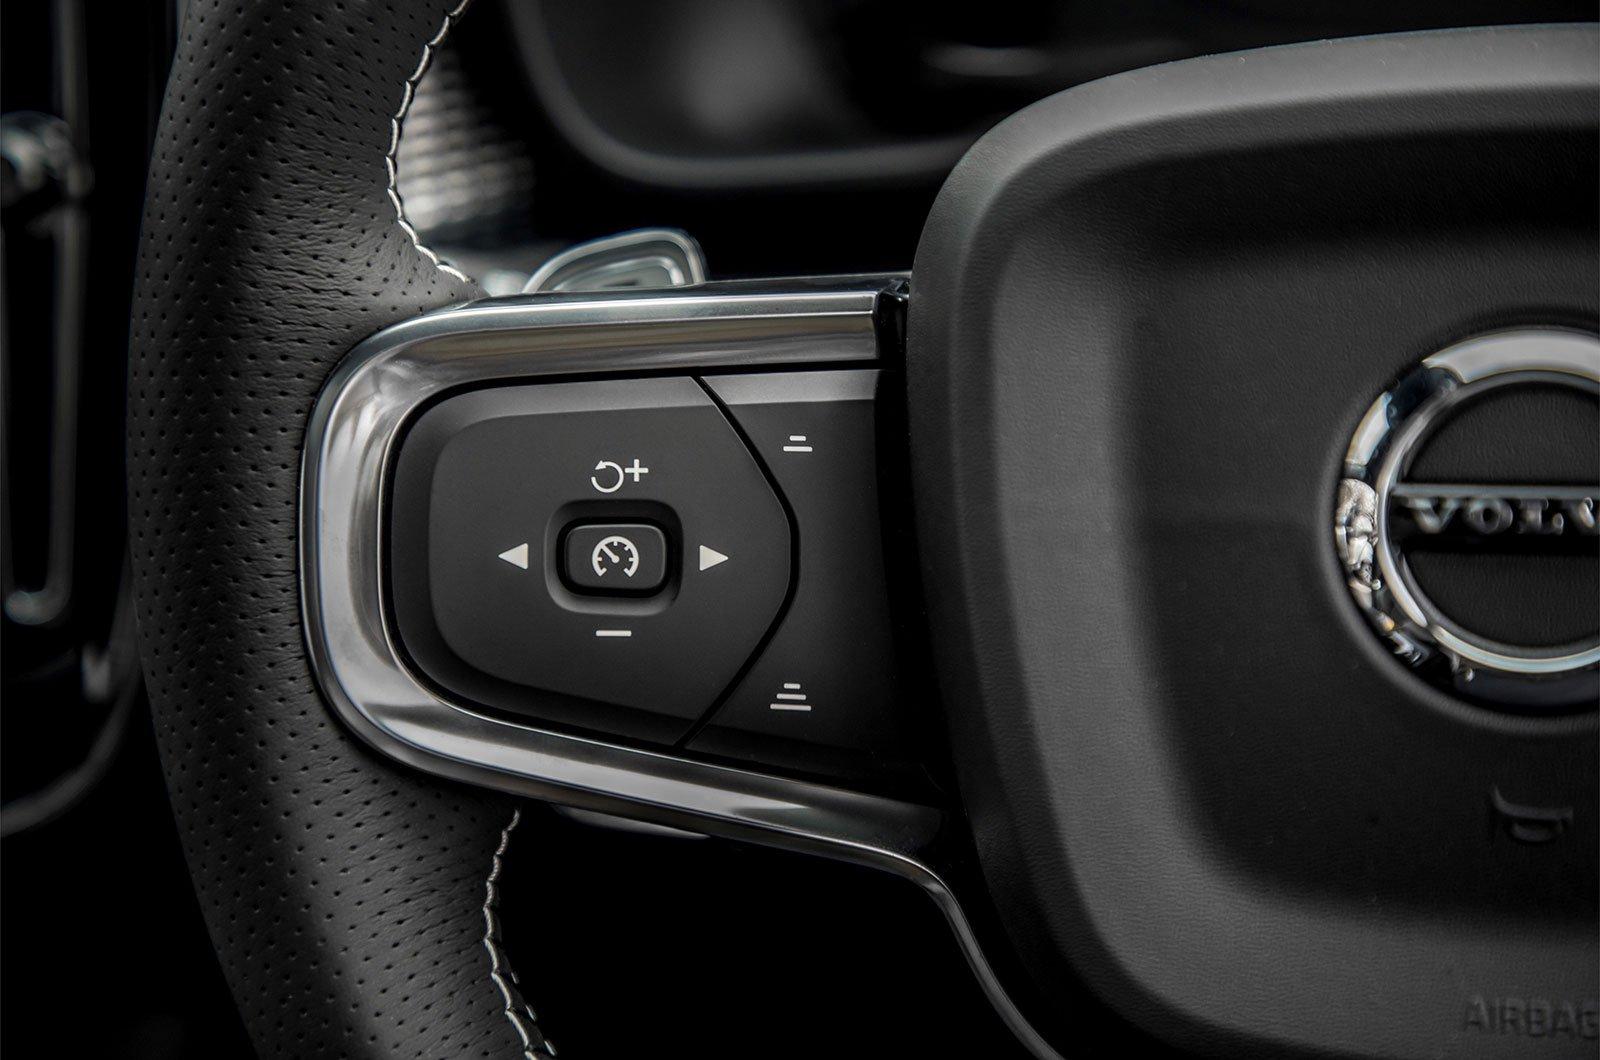 Volvo XC40 adaptive cruise control